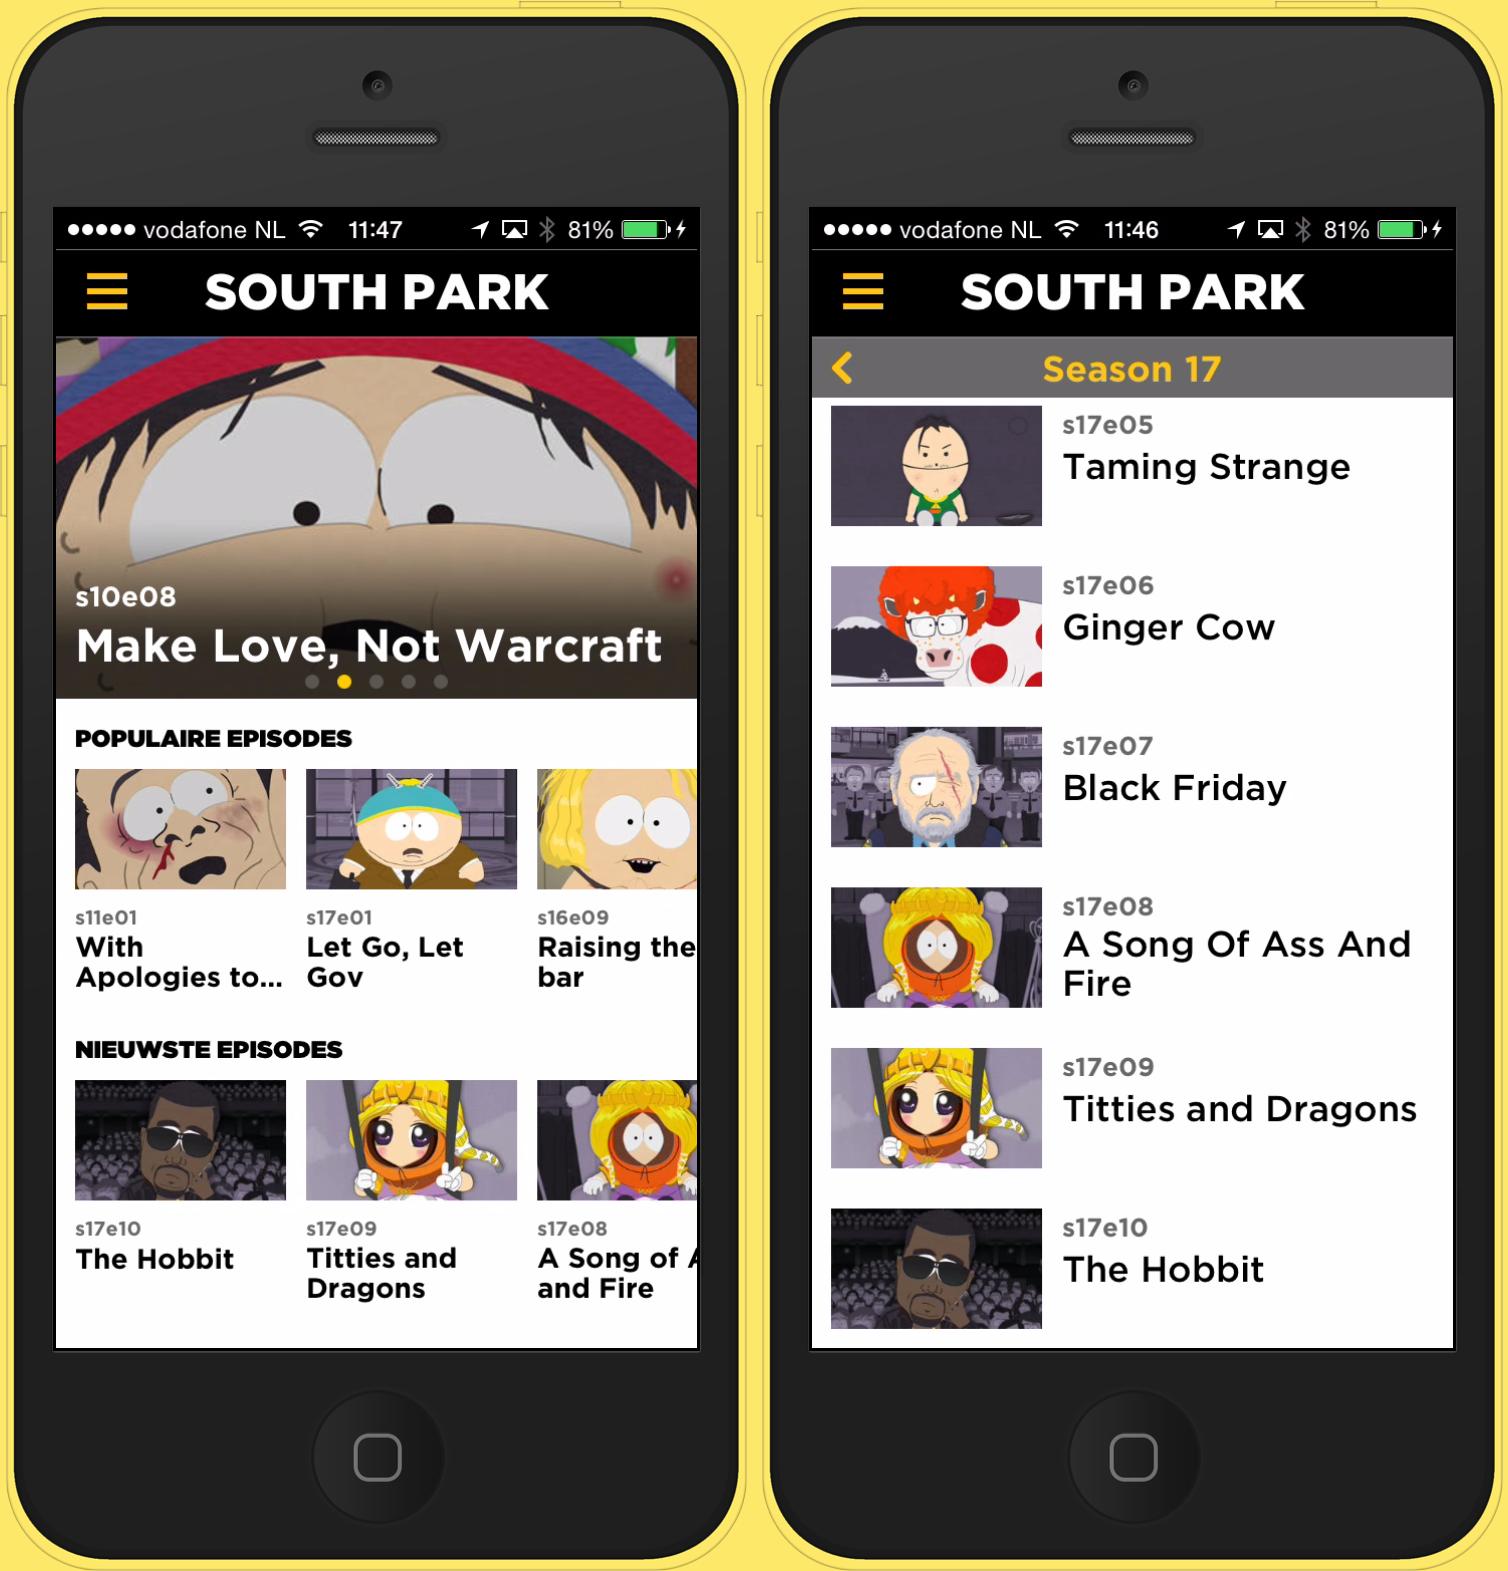 southpark-1